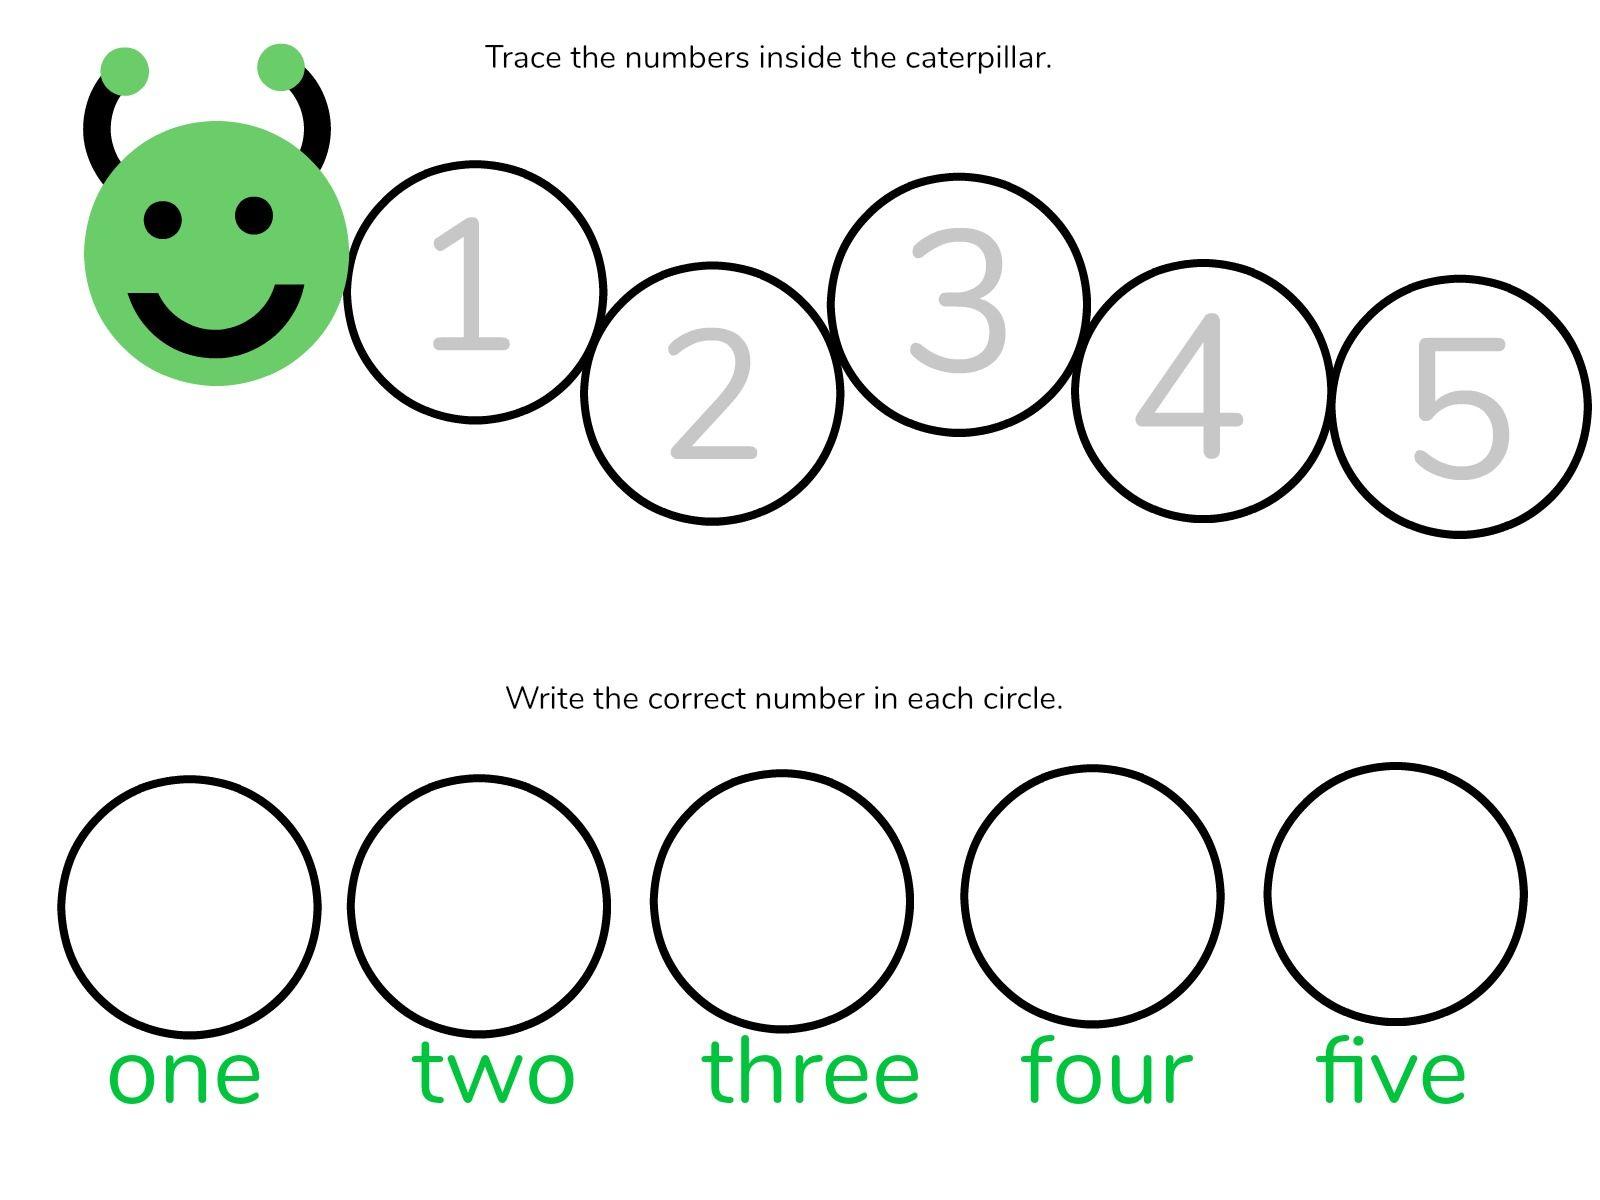 Caterpillar Math Free Printable Preschool Worksheets Numbers 1 5 Preschool Worksheets Preschool Number Worksheets Free Math [ 1200 x 1600 Pixel ]